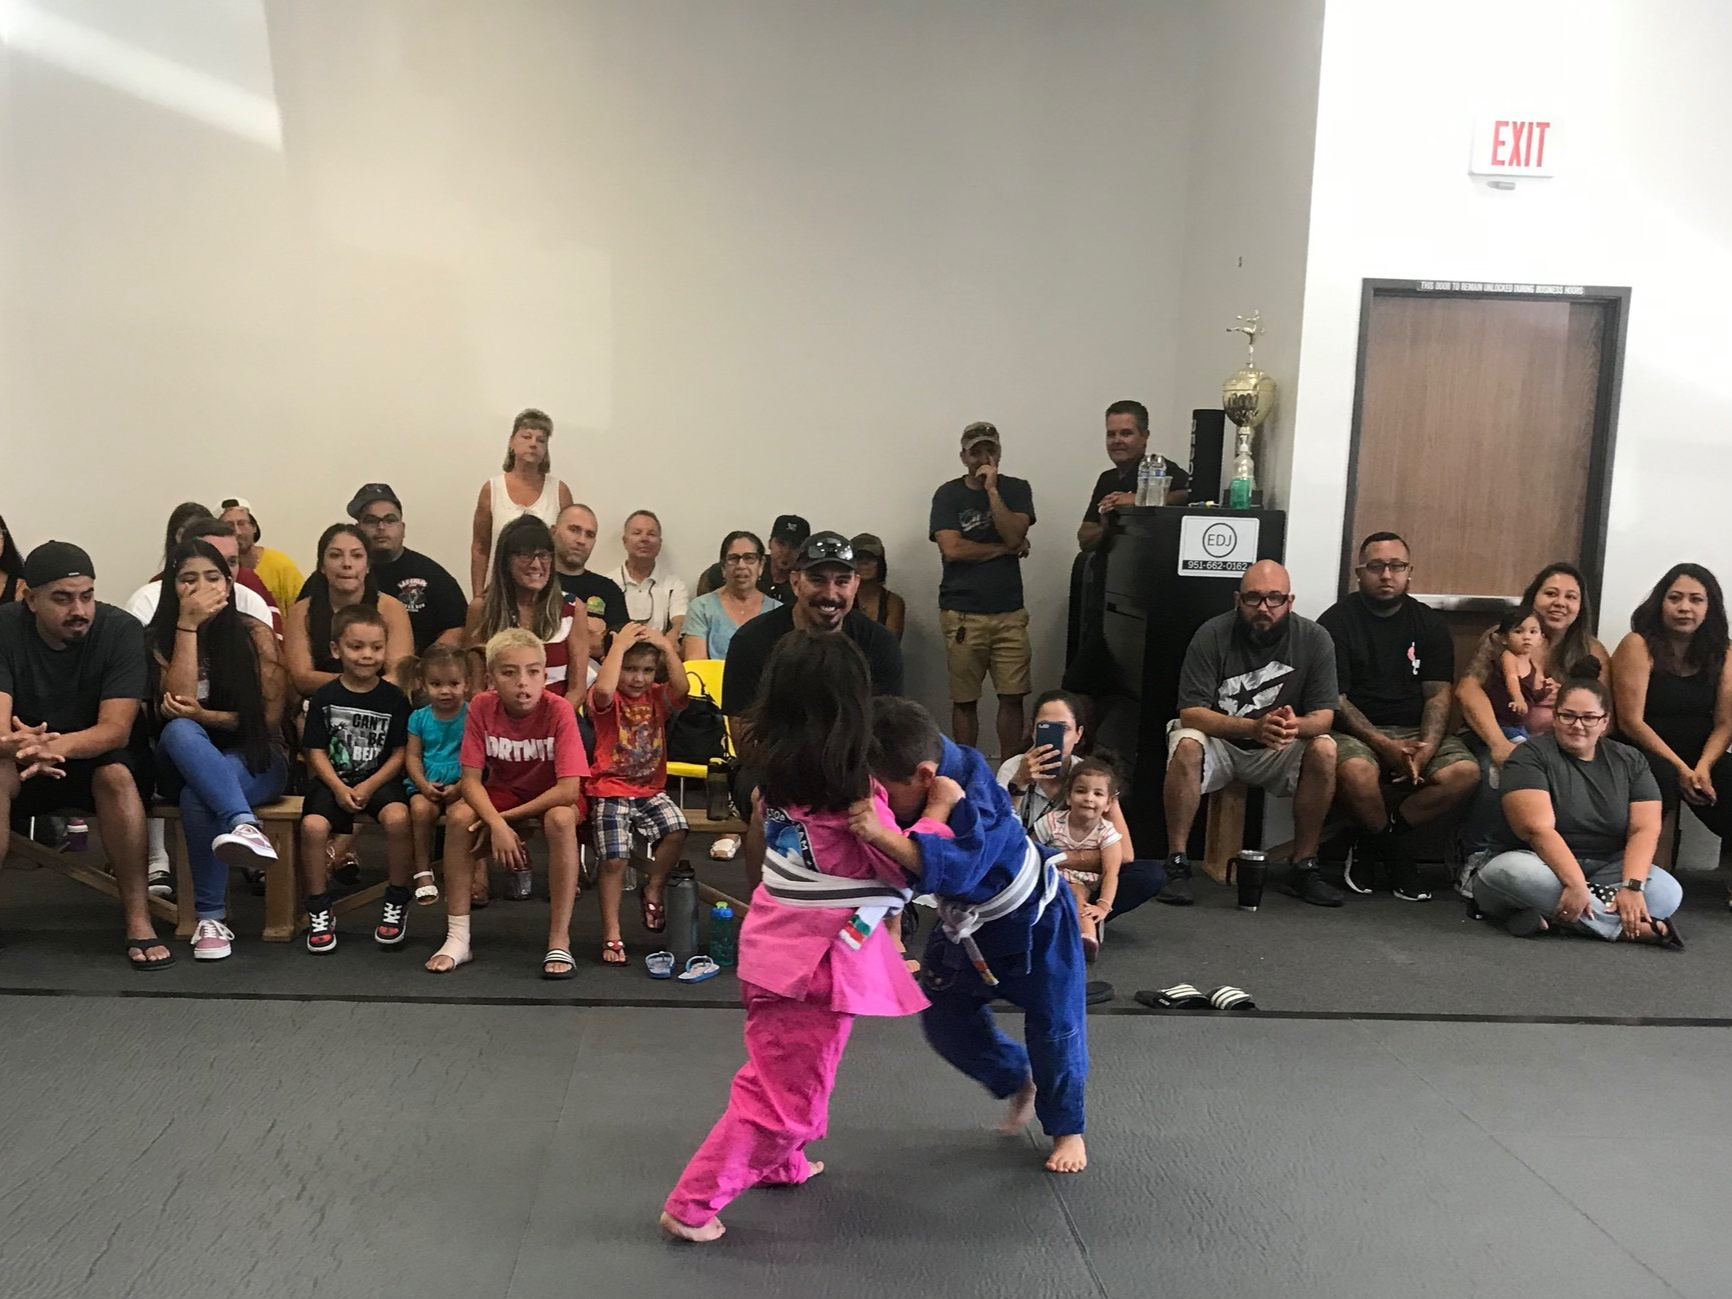 Kids+Martial+Arts+competition+corona